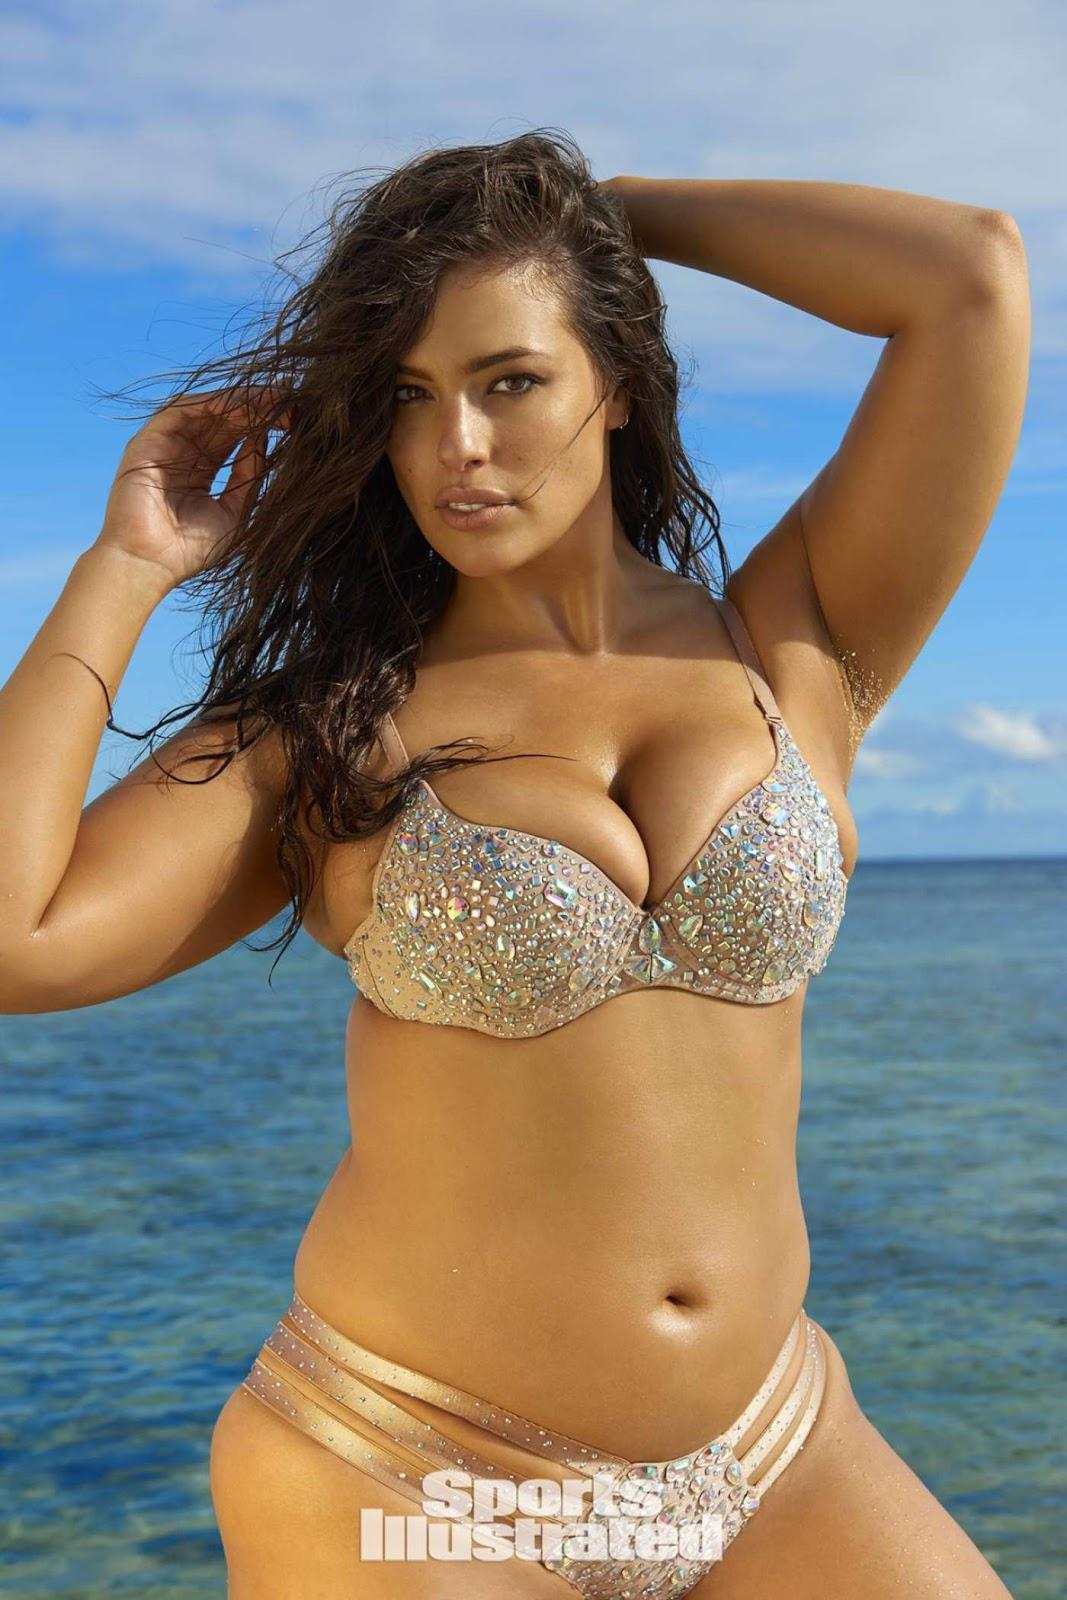 kardashian-plus-size-bikini-models-gallery-legs-blow-job